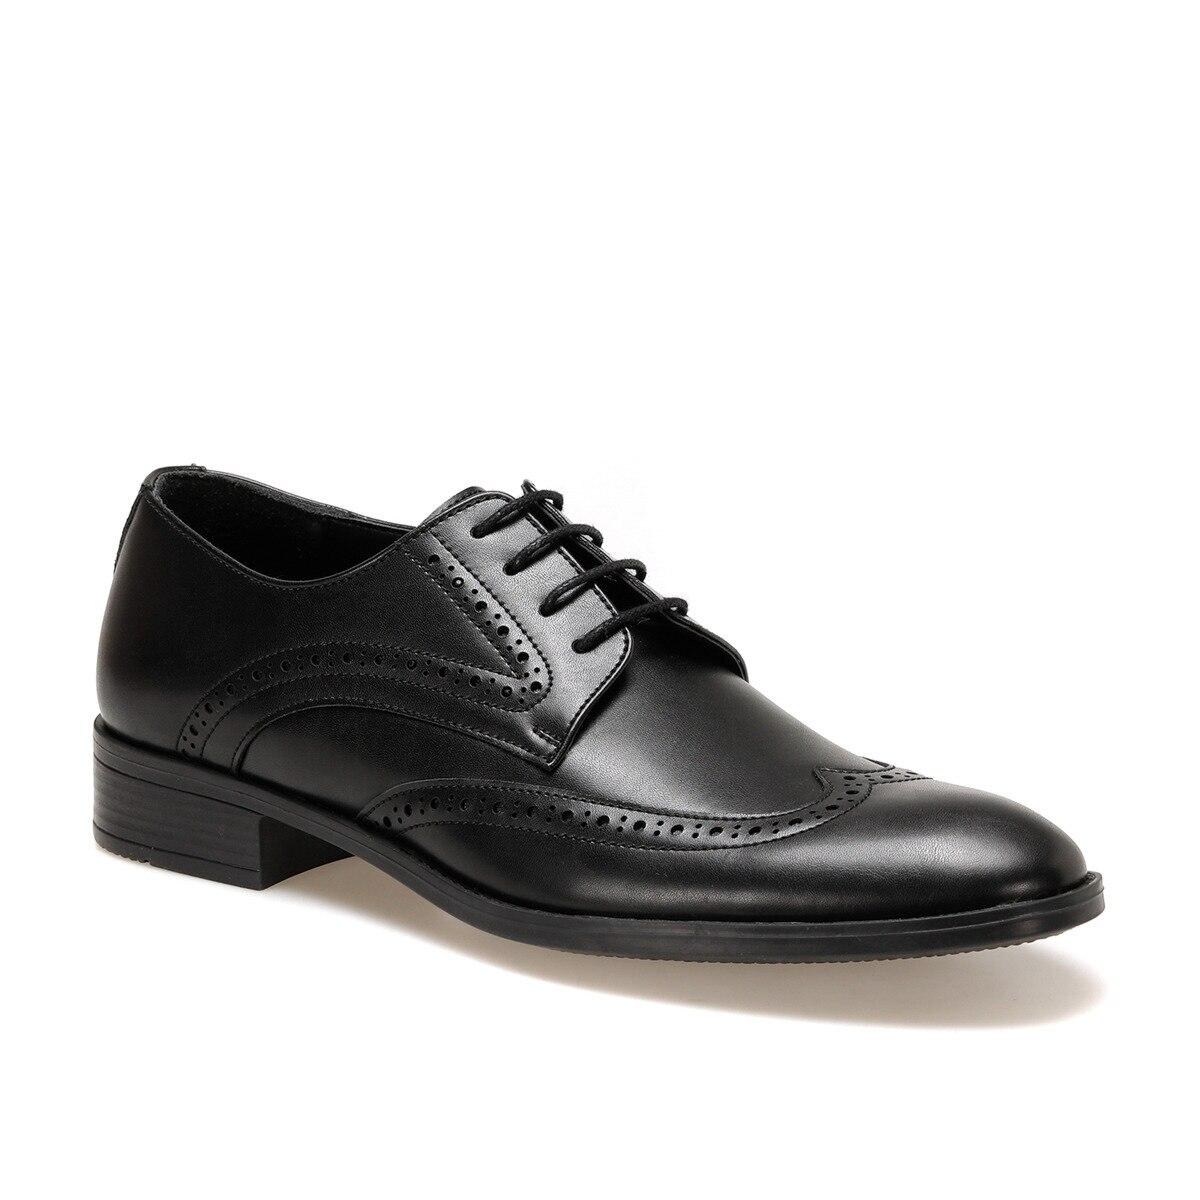 FLO 113-5 Black Men Dress Shoes DOWN TOWN